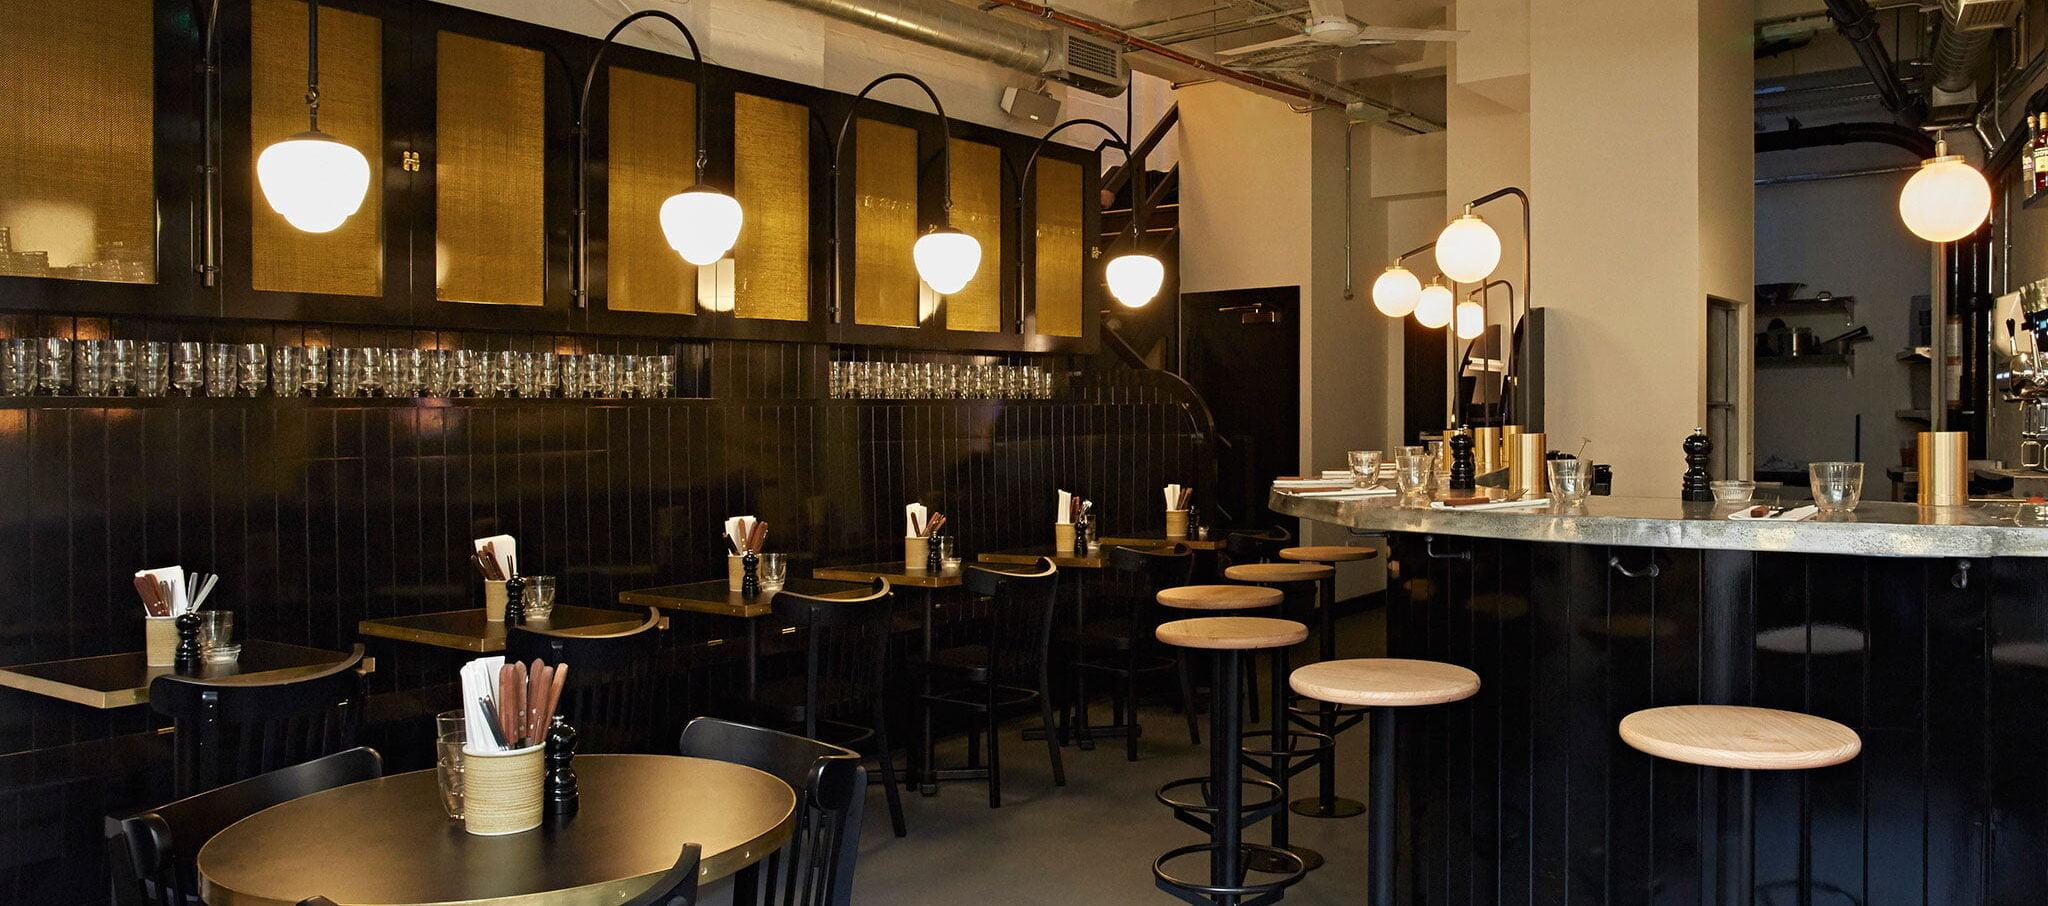 padella london bridge restaurants